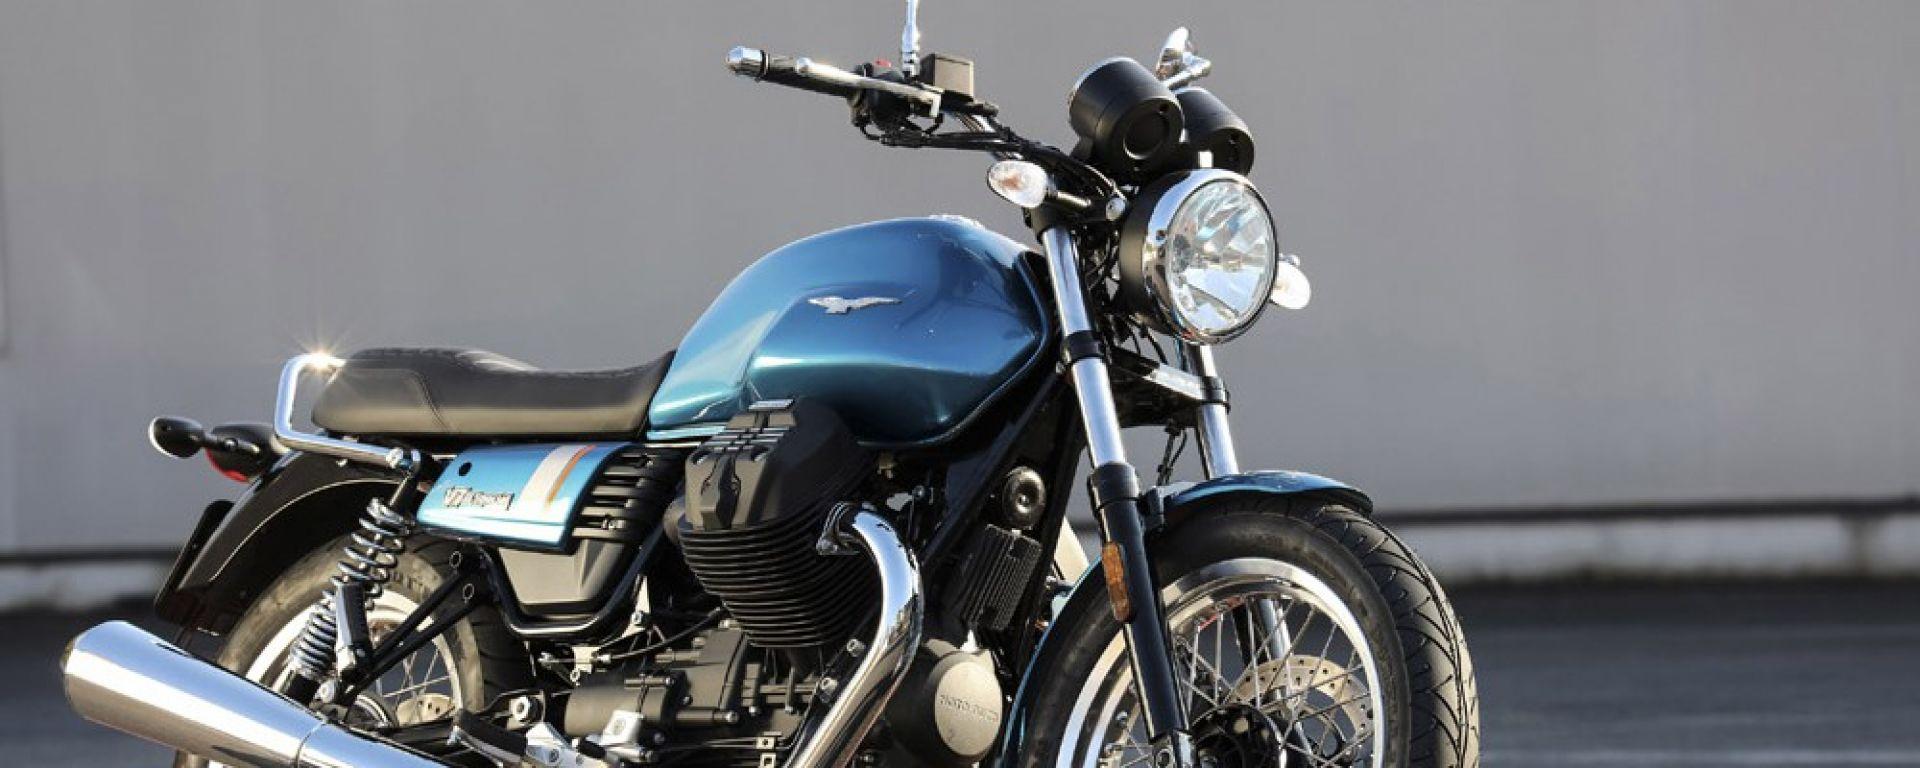 novit moto moto guzzi v7 iii stone e special ecco i prezzi motorbox. Black Bedroom Furniture Sets. Home Design Ideas